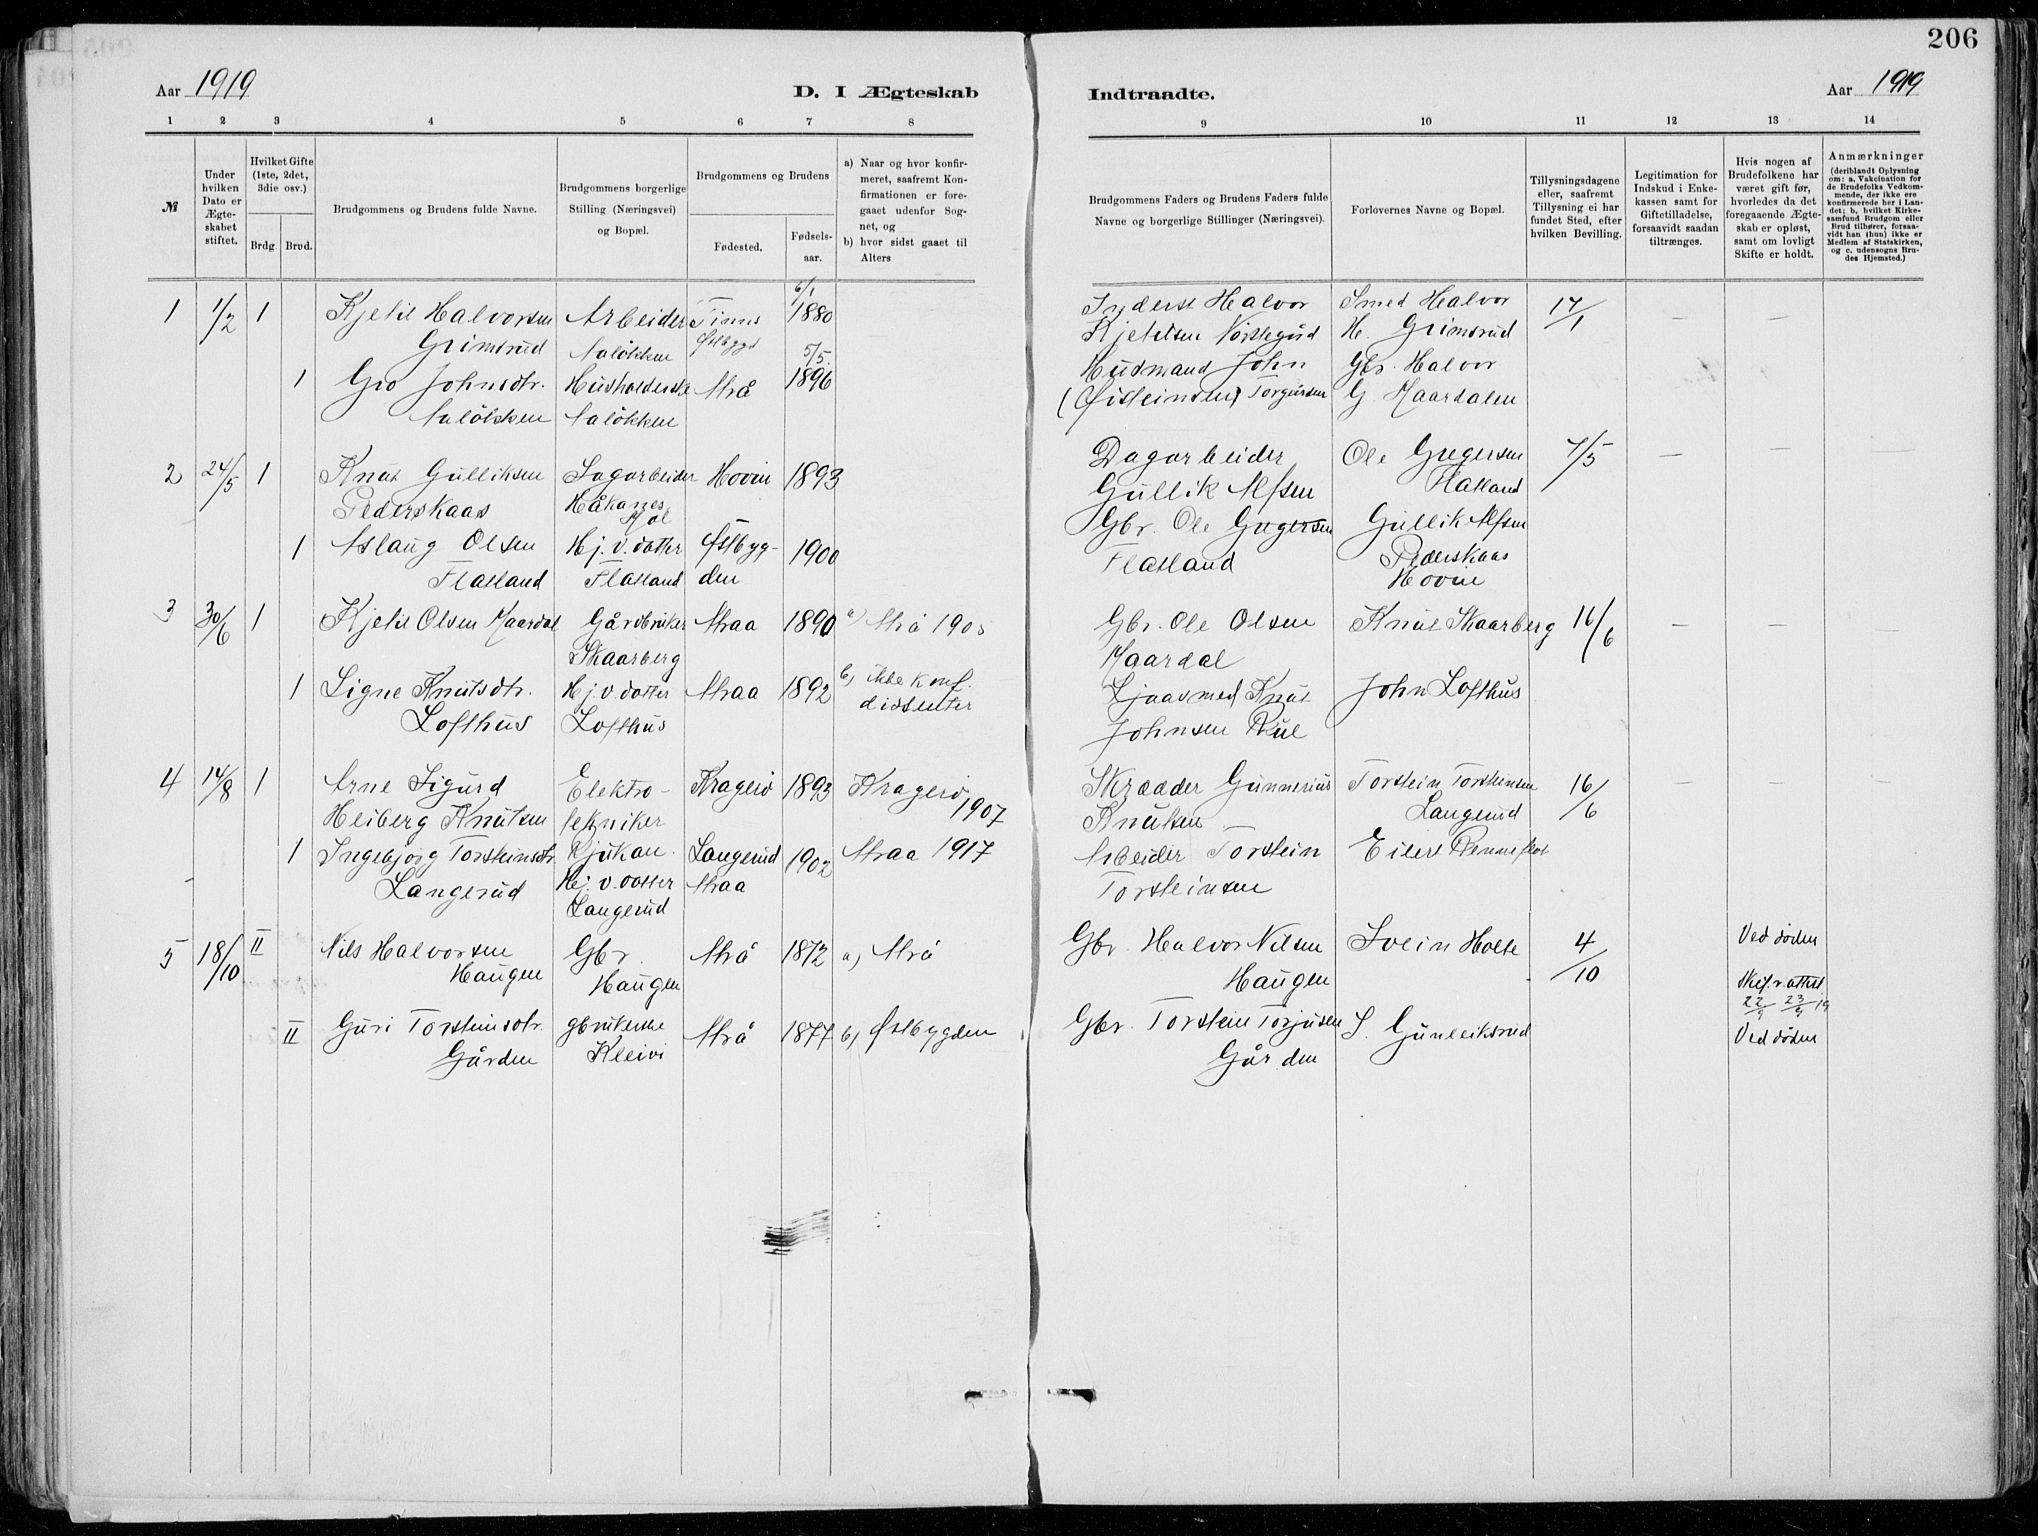 SAKO, Tinn kirkebøker, F/Fa/L0007: Ministerialbok nr. I 7, 1878-1922, s. 206